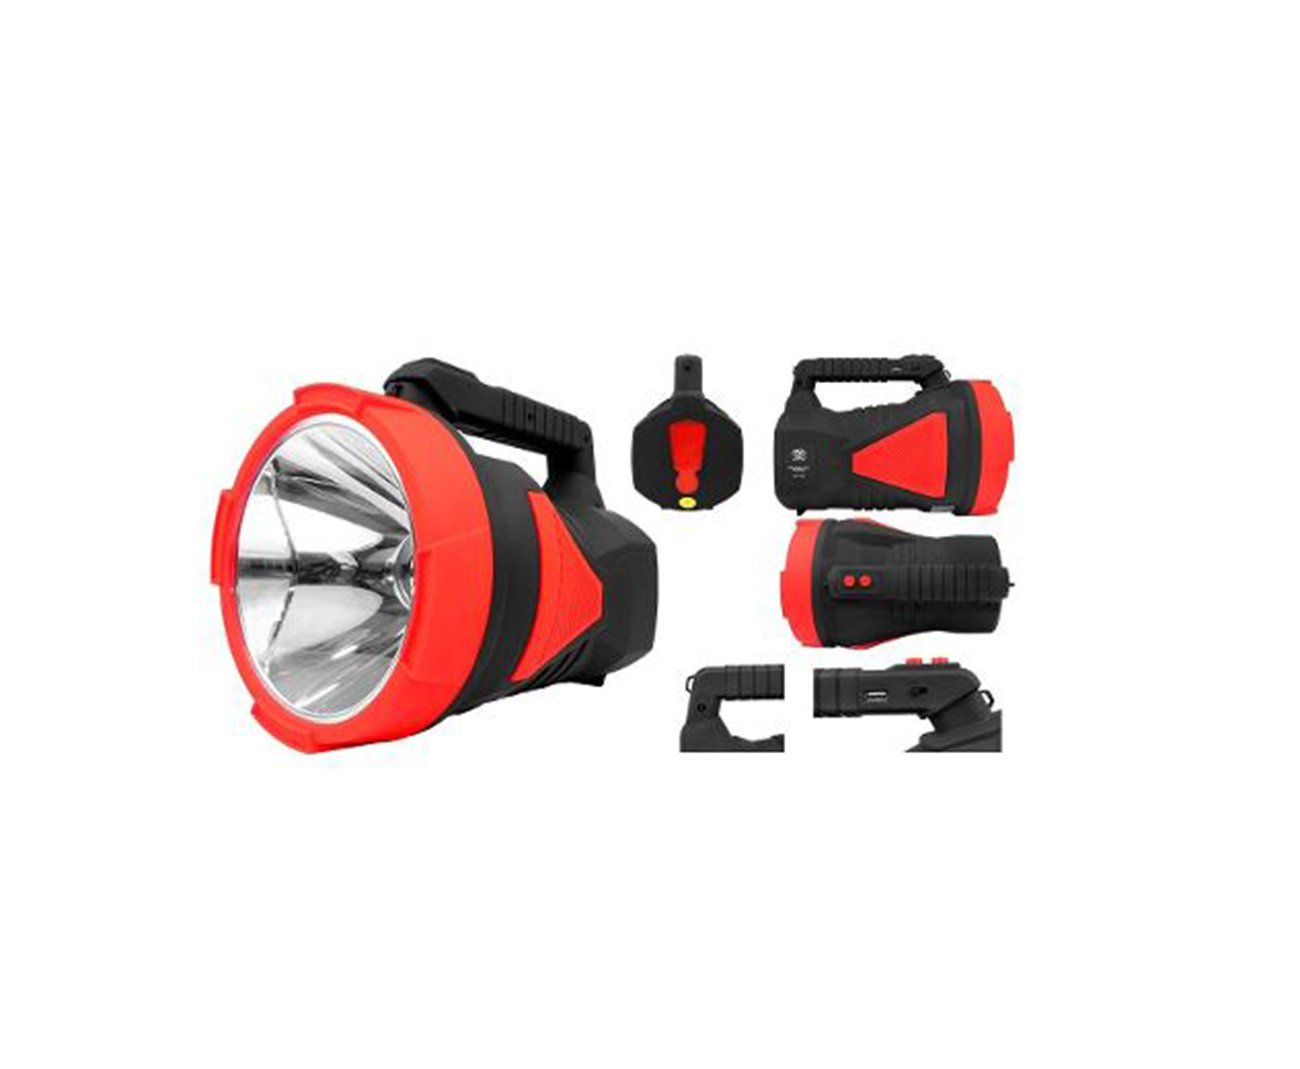 Holofote/lanterna Recarregavel 7054  1led 20w Alcance Até 1000 Metros - Albatroz